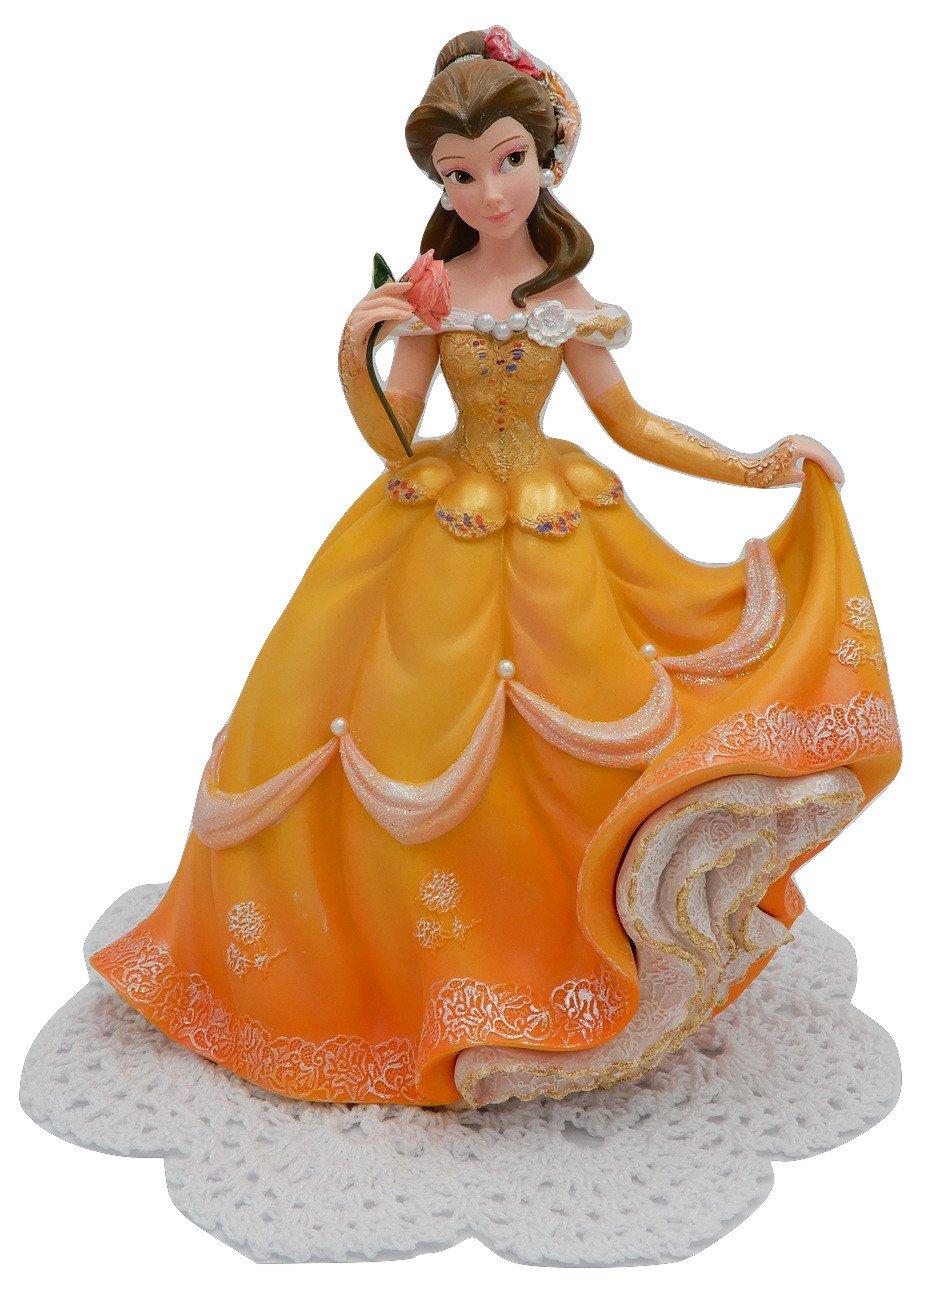 Belle Enesco Disney Showcase Couture de Force Princess Stone Resin Figurine with Westbraid Doily